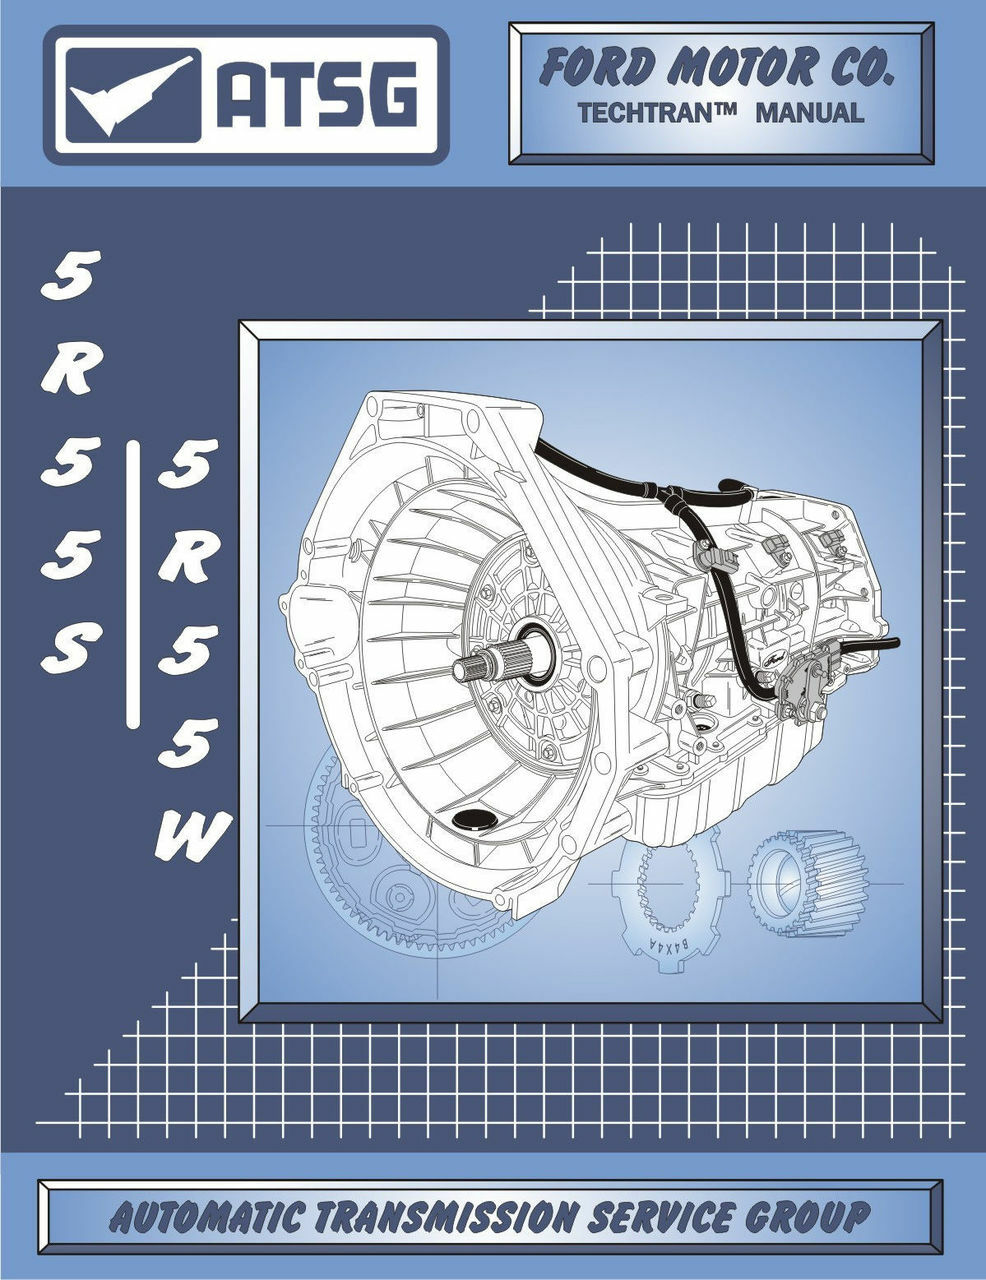 atsg tech manual 5r55w 5r55s ford mercury jaguar 2002 on rebuild guide book new ct powertrain products [ 986 x 1280 Pixel ]